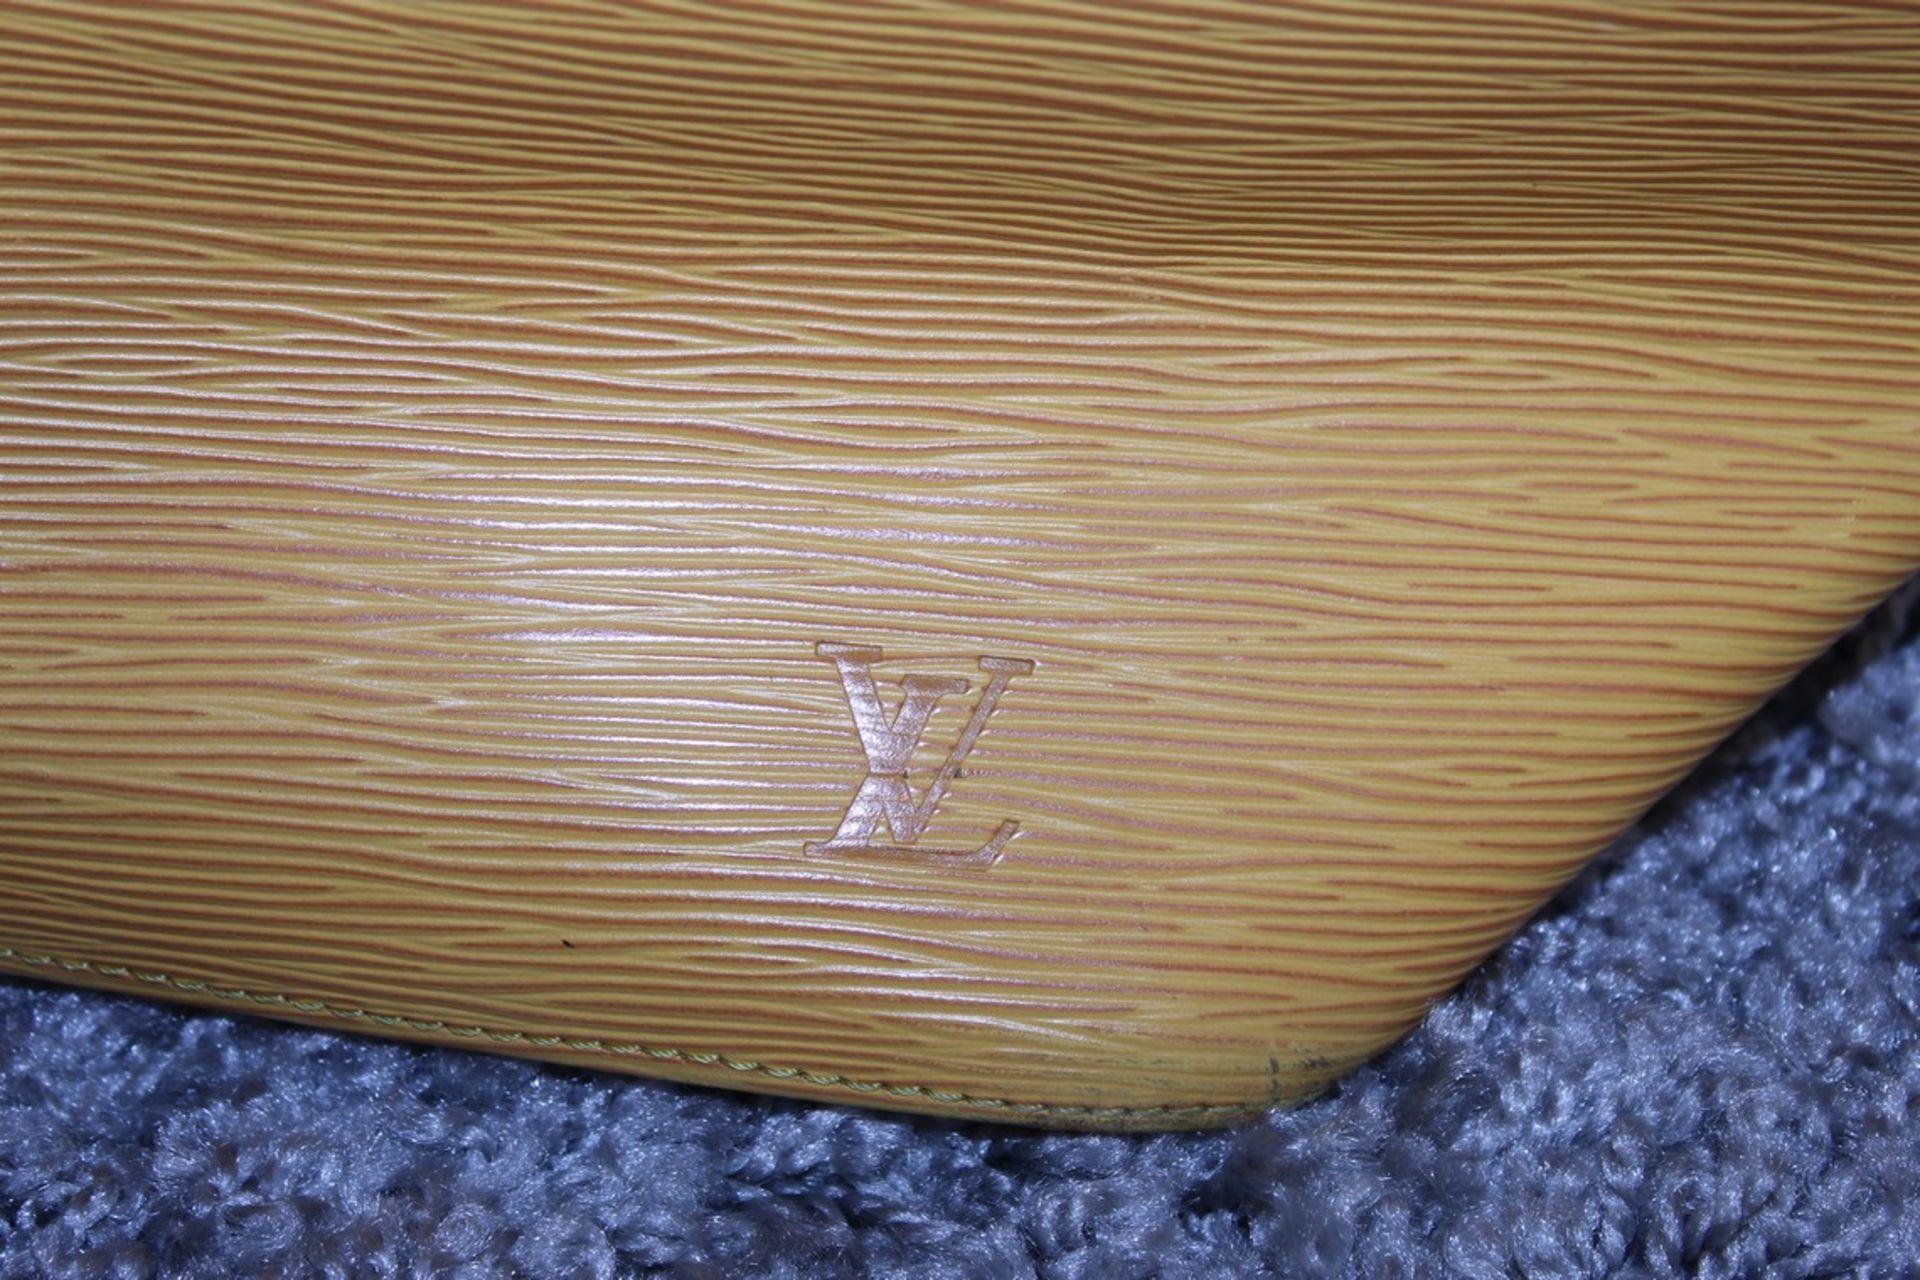 RRP £1,200 Louis Vuitton Noe Yellow Shoulder Bag, Epi Yellow Calf Leather 24X26X18Cm (Production - Image 2 of 3